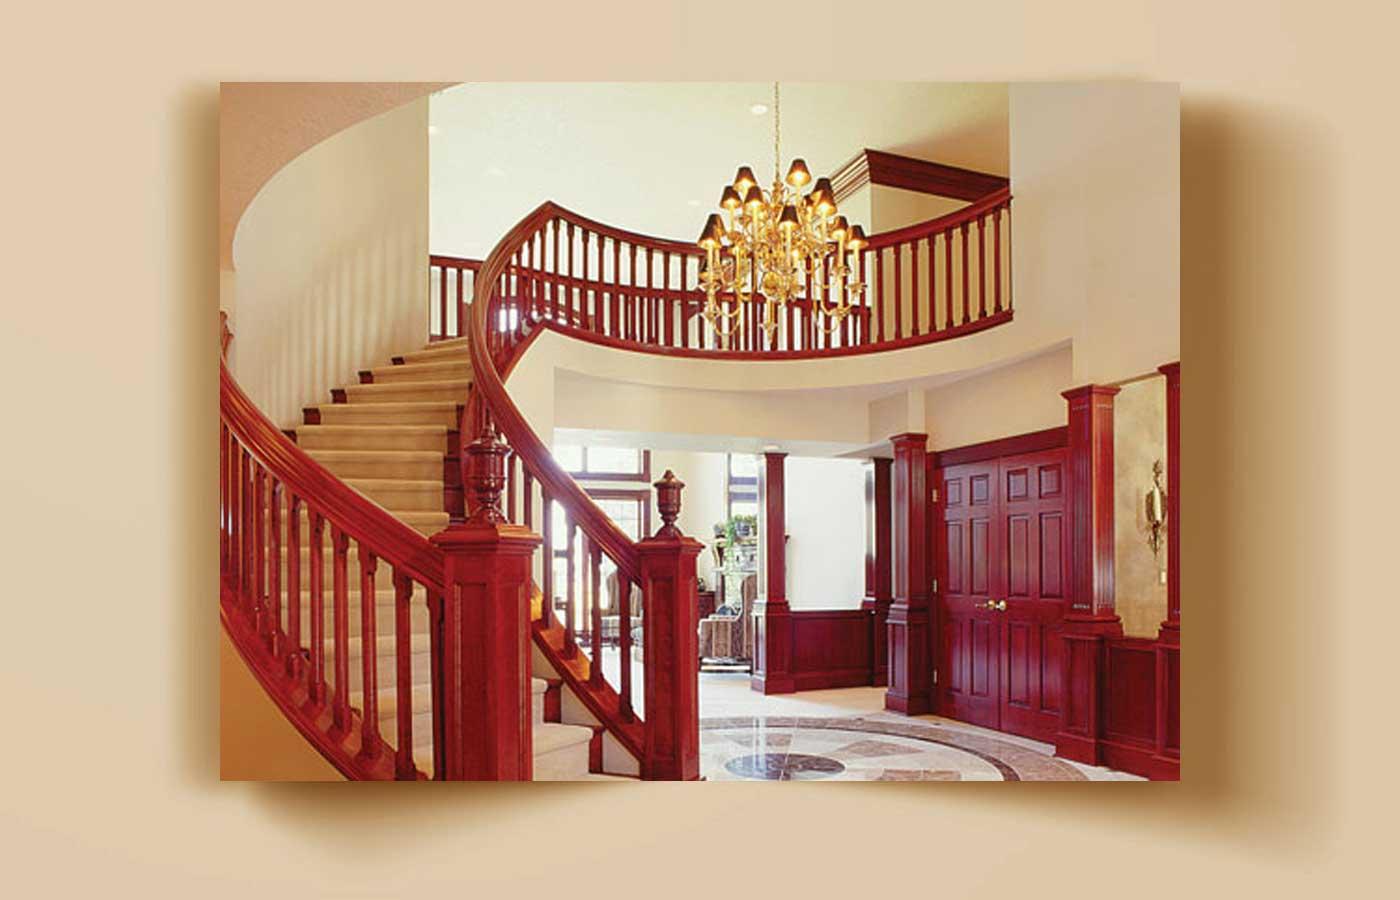 as 1 - لوستر در سبک های طراحی داخلی بی نظیر